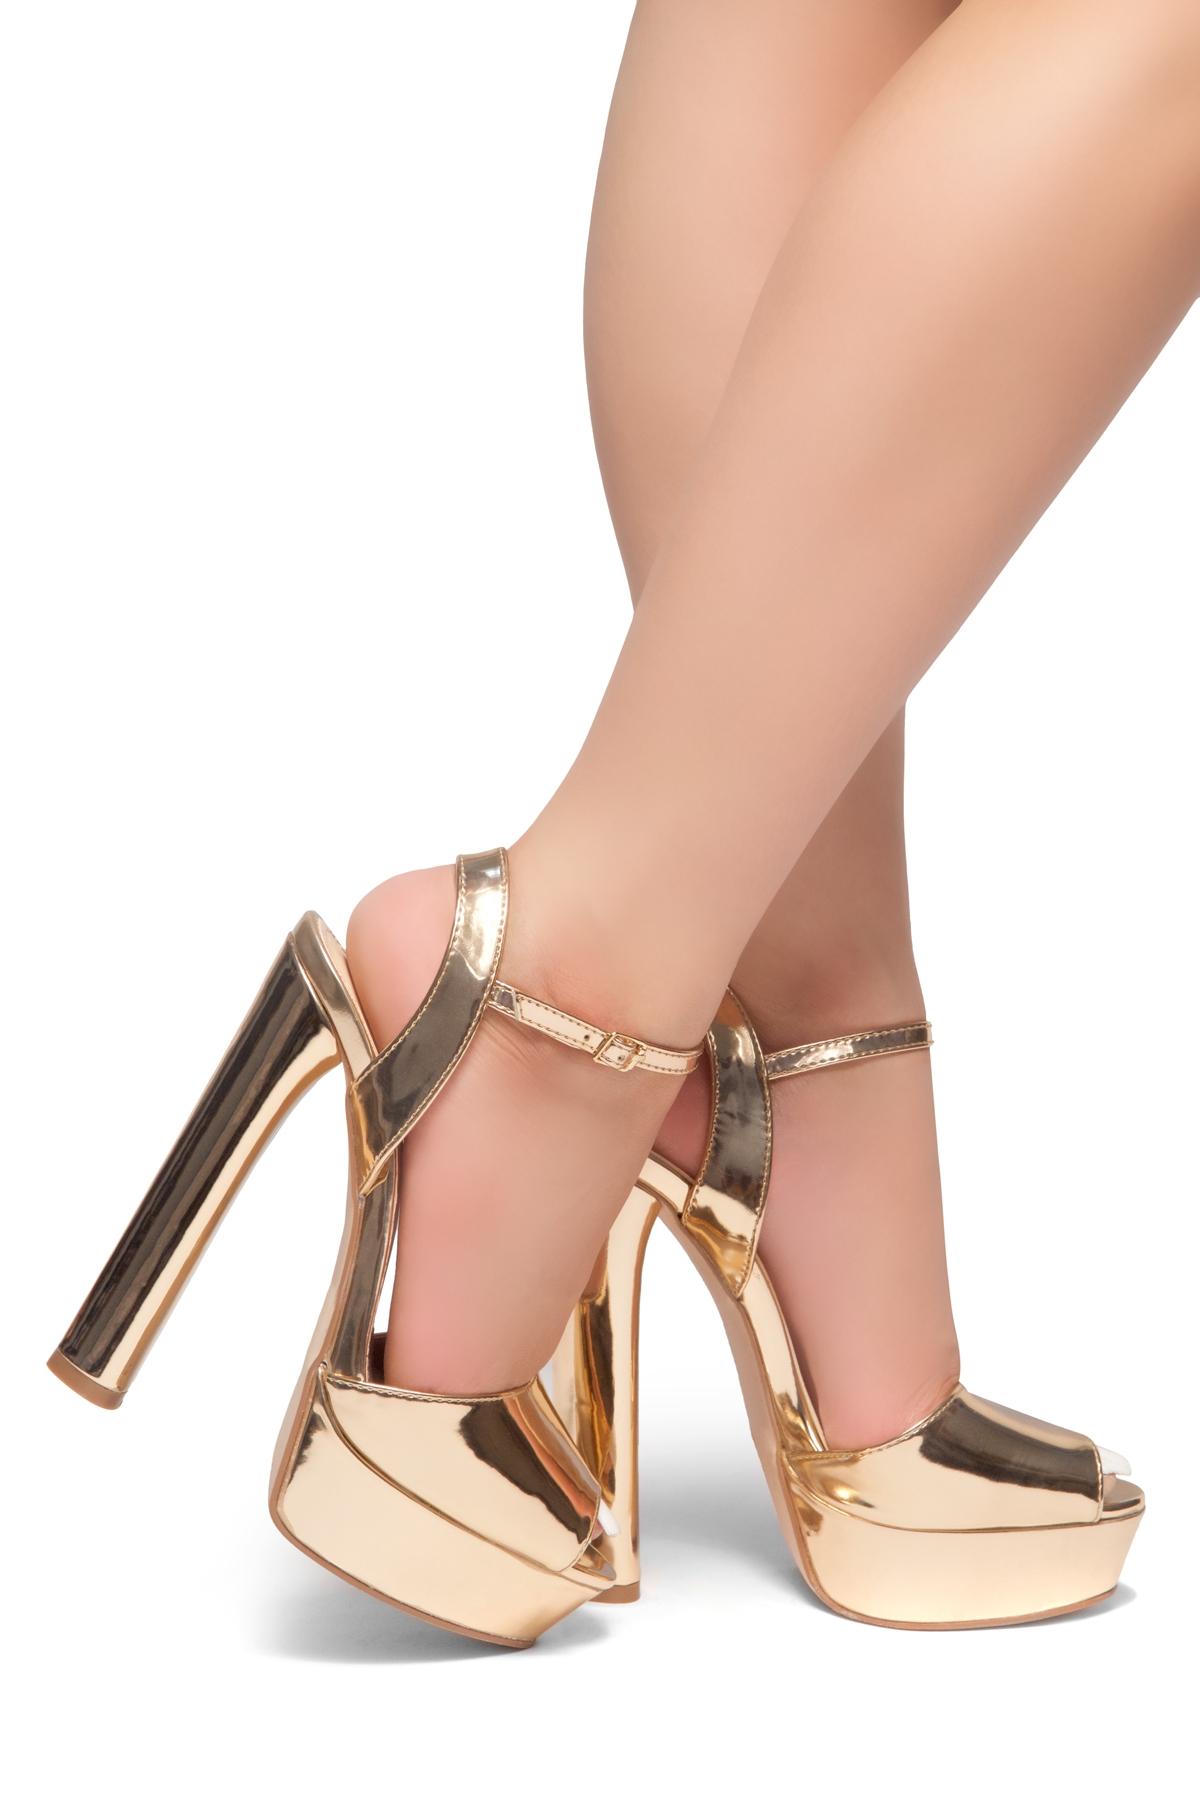 639d1a997fc335 HerStyle CHASITY-Peep Toe Platform Heel (Rose Gold)